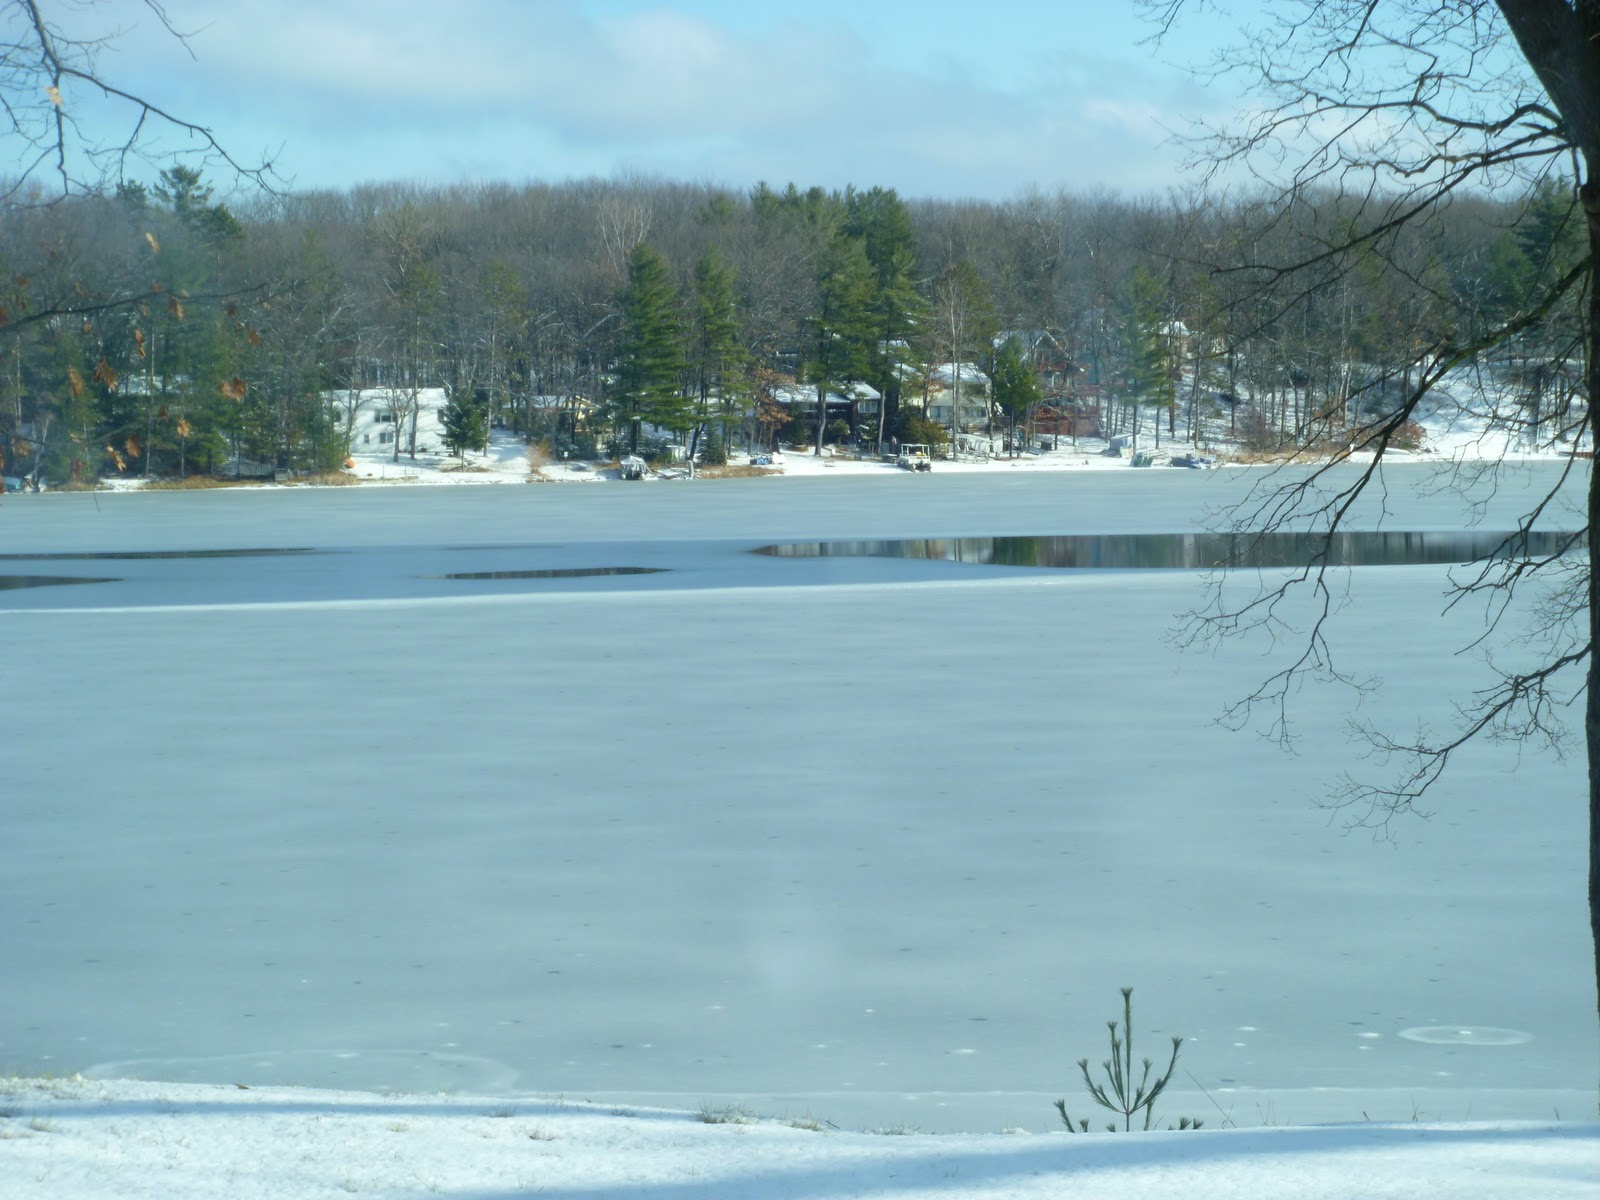 Houghton lake walleye report budd lake ice conditions 12 for Enid lake fishing report